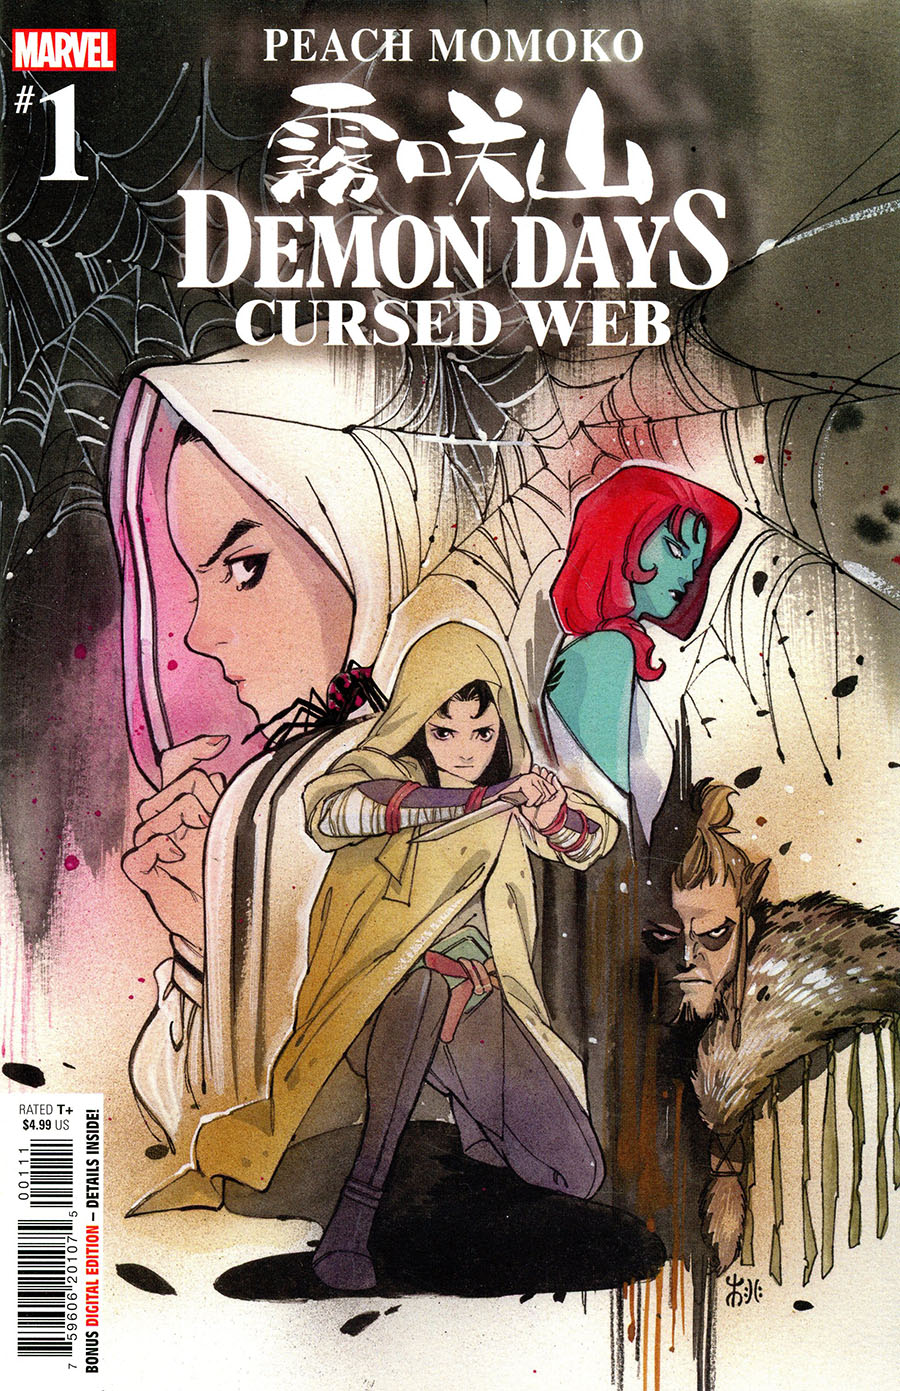 Demon Days Cursed Web #1 (One Shot) Cover A Regular Peach Momoko Cover